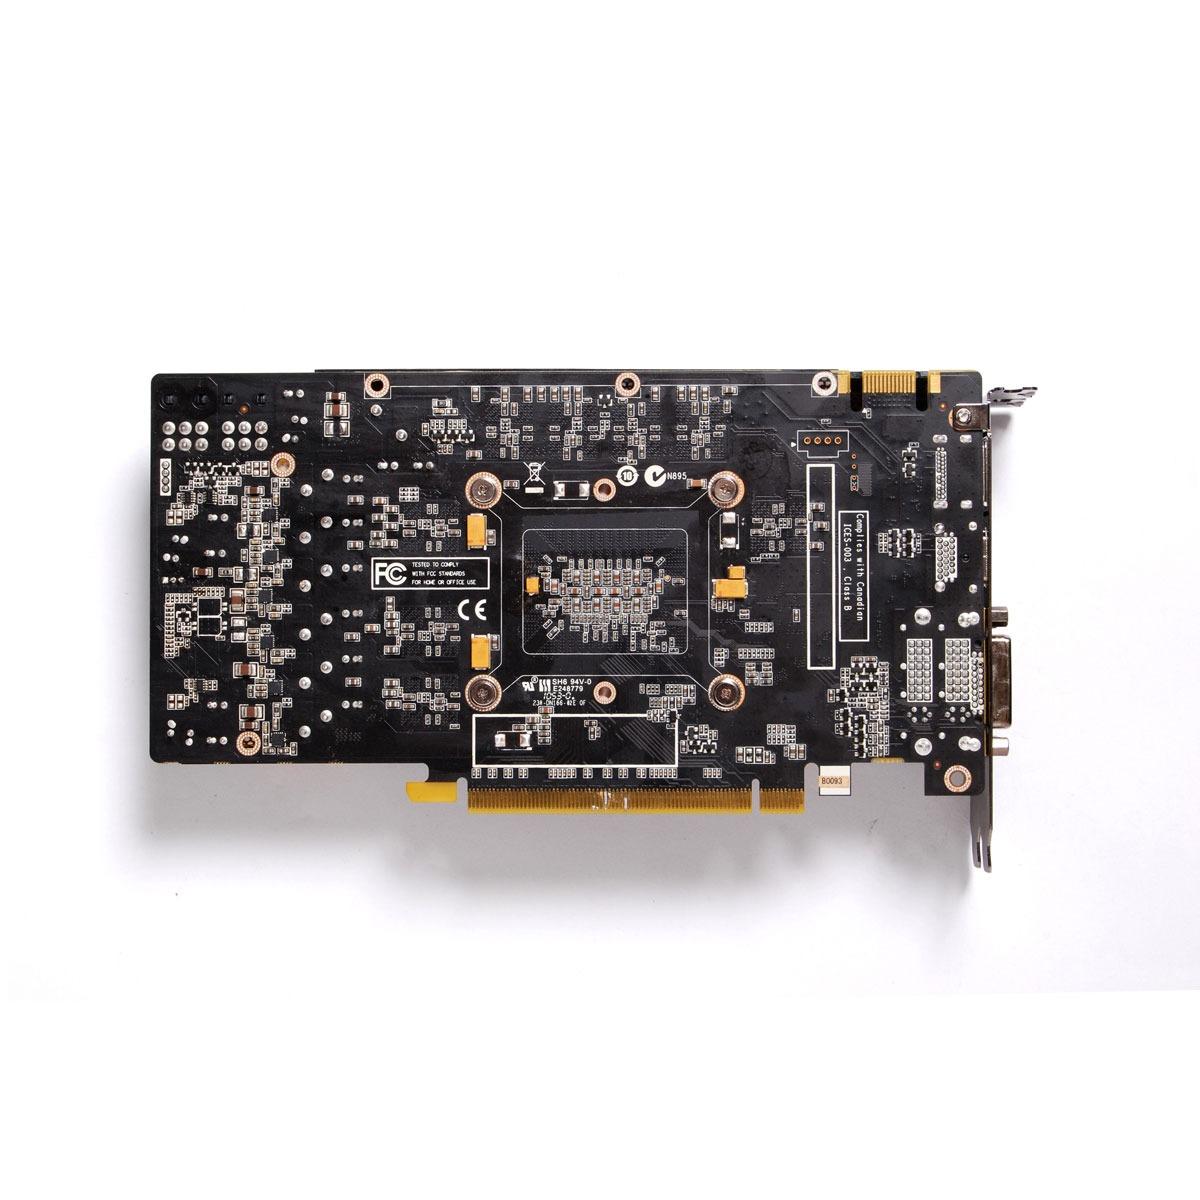 Carte graphique ZOTAC GeForce GTX560 Ti 1GB ZOTAC GeForce GTX560 Ti 1GB - 1024 Mo Dual DVI/HDMI/DisplayPort - PCI Express (NVIDIA GeForce avec CUDA GTX 560 Ti)